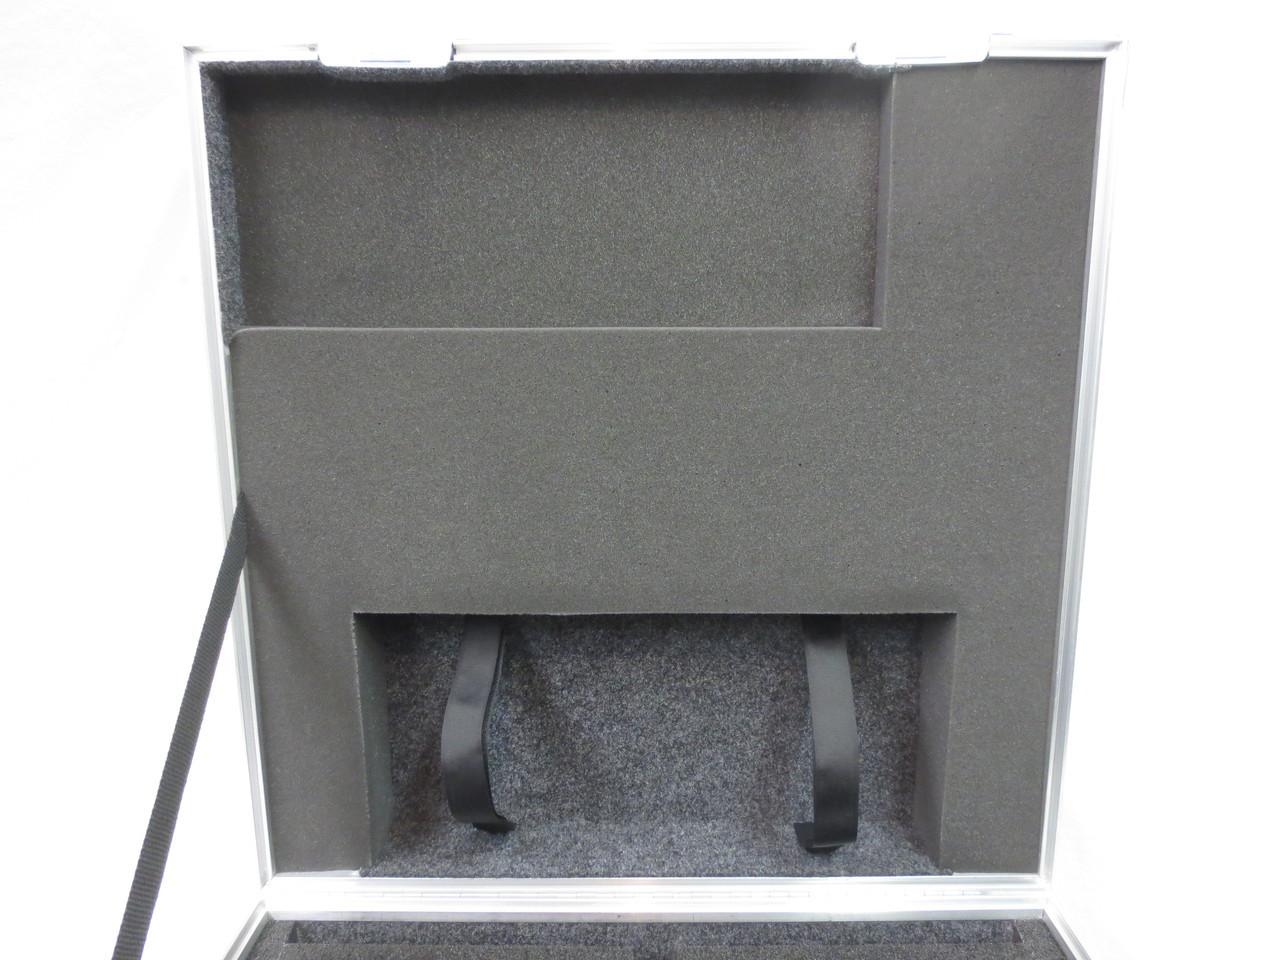 OBox, Filters, Flag, FF5 (Accessories Case)